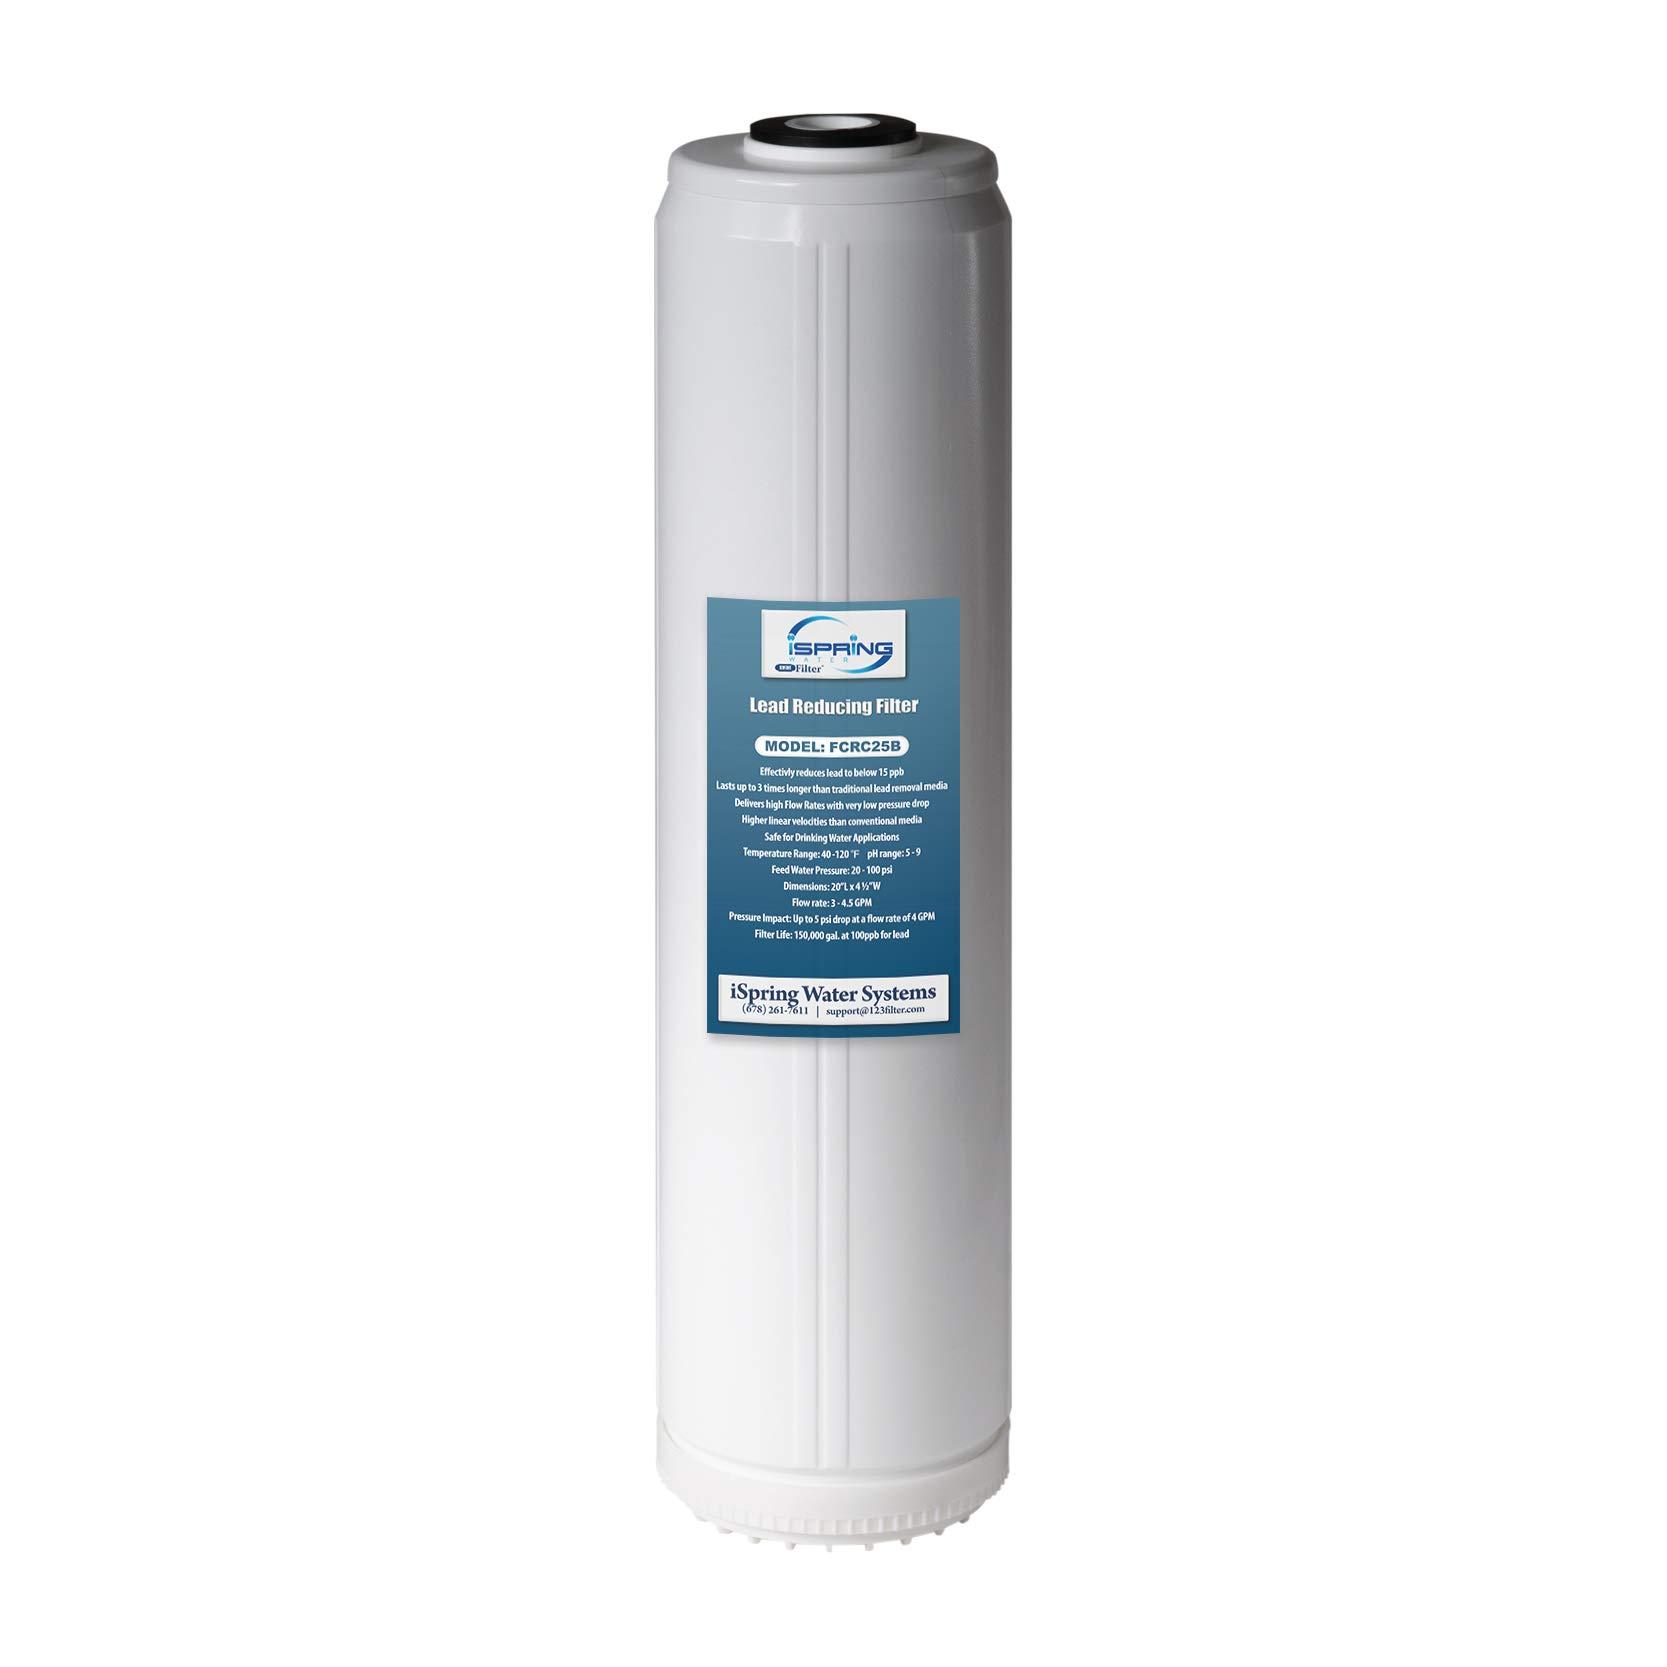 "iSpring FCRC25B High Capacity 20"" x 4.5"" Water Filter Replacement Cartridge Lead Reducing, Big Blue"